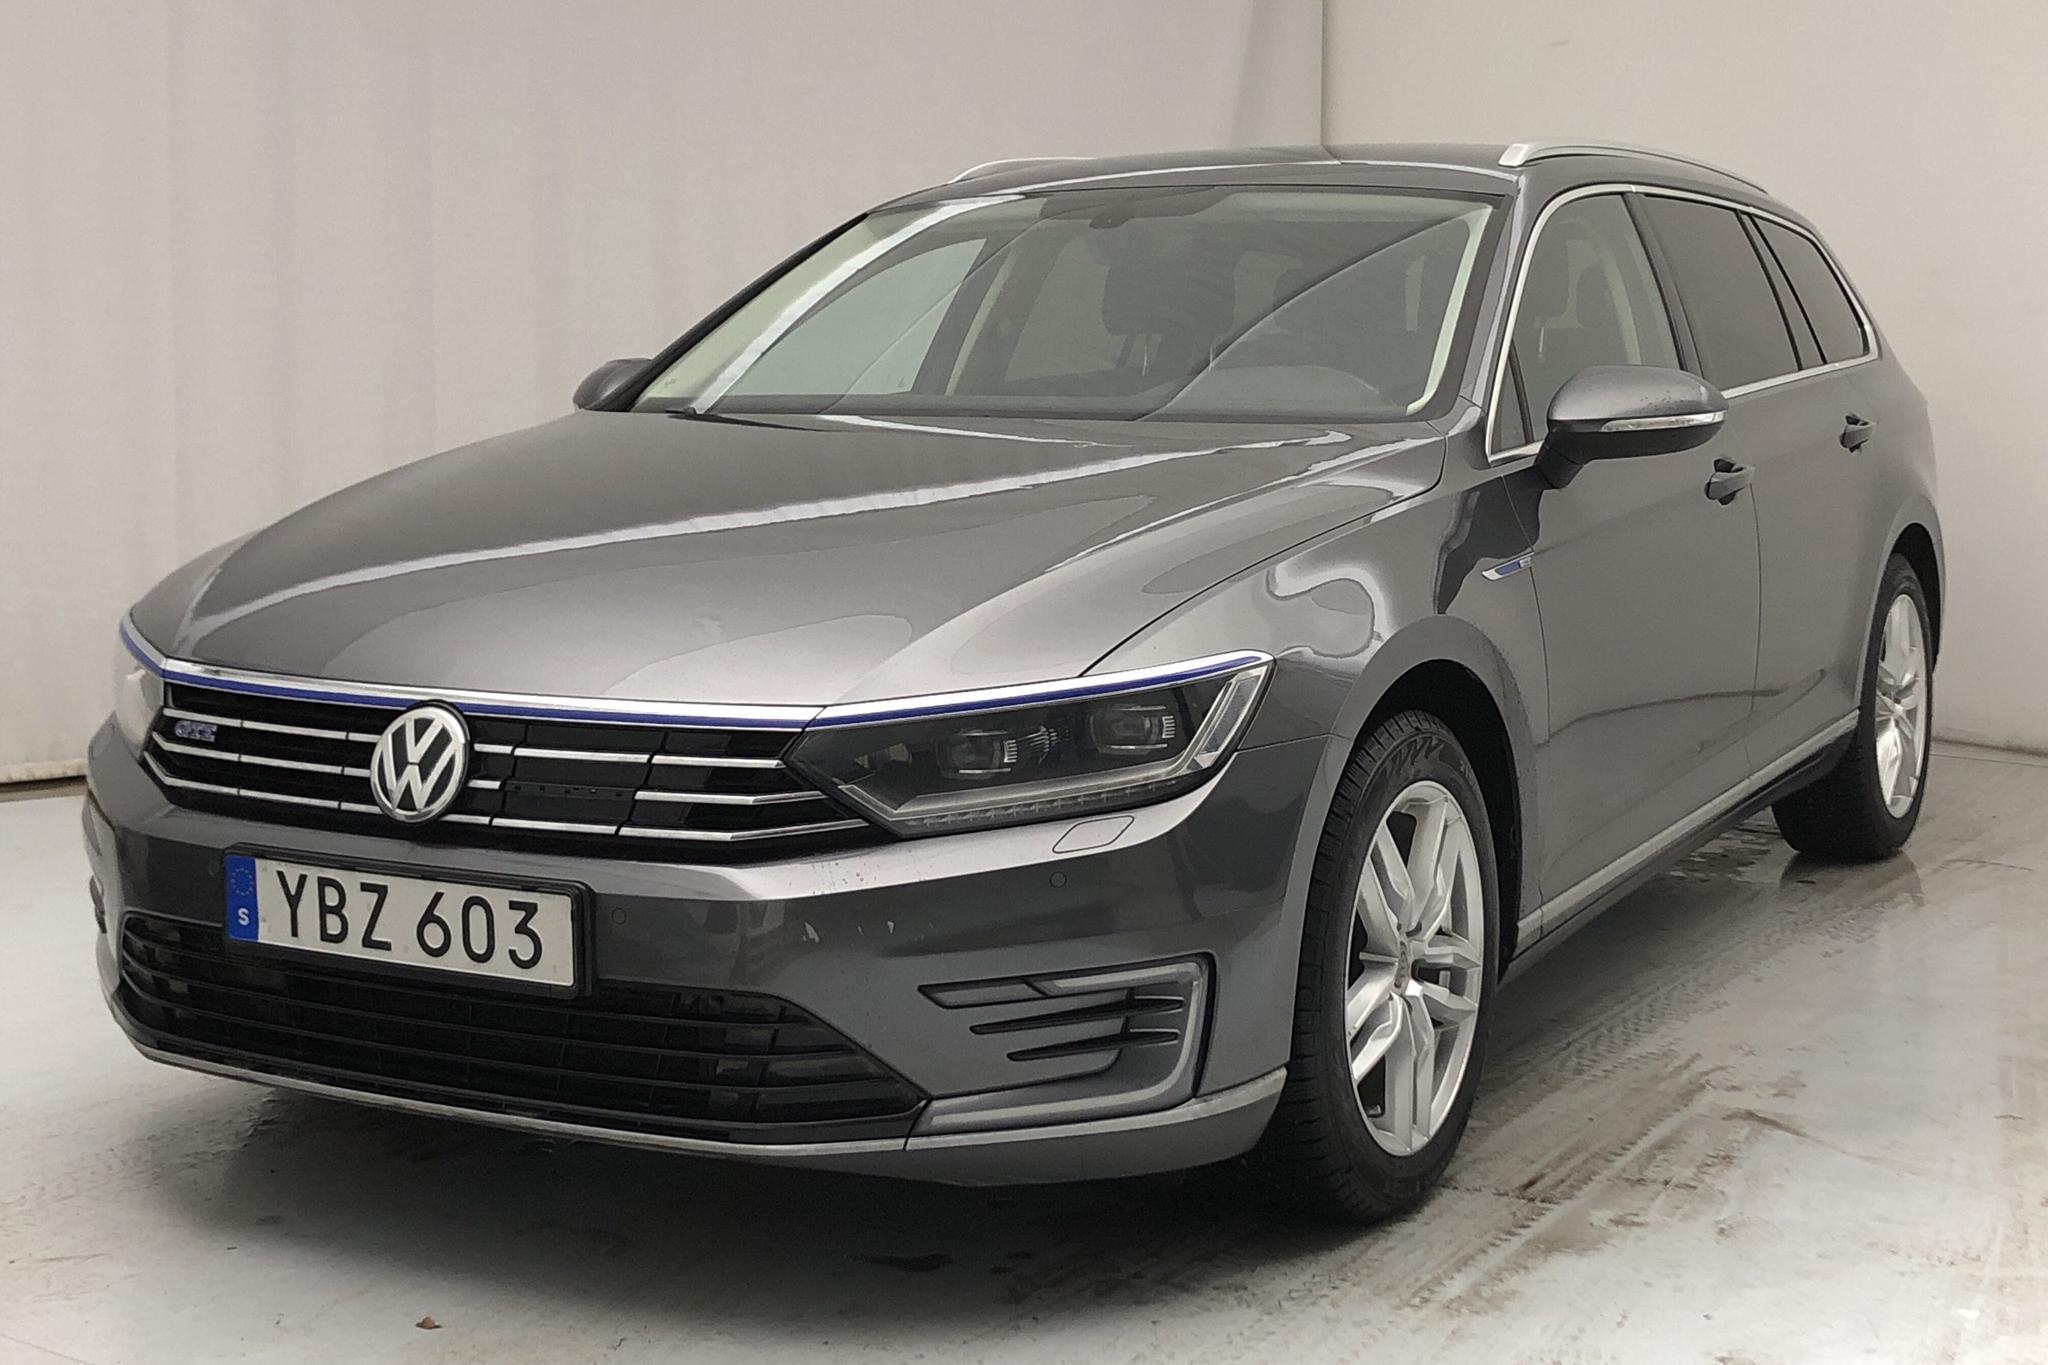 VW Passat 1.4 Plug-in-Hybrid Sportscombi (218hk) - 135 310 km - Automatic - Dark Grey - 2016